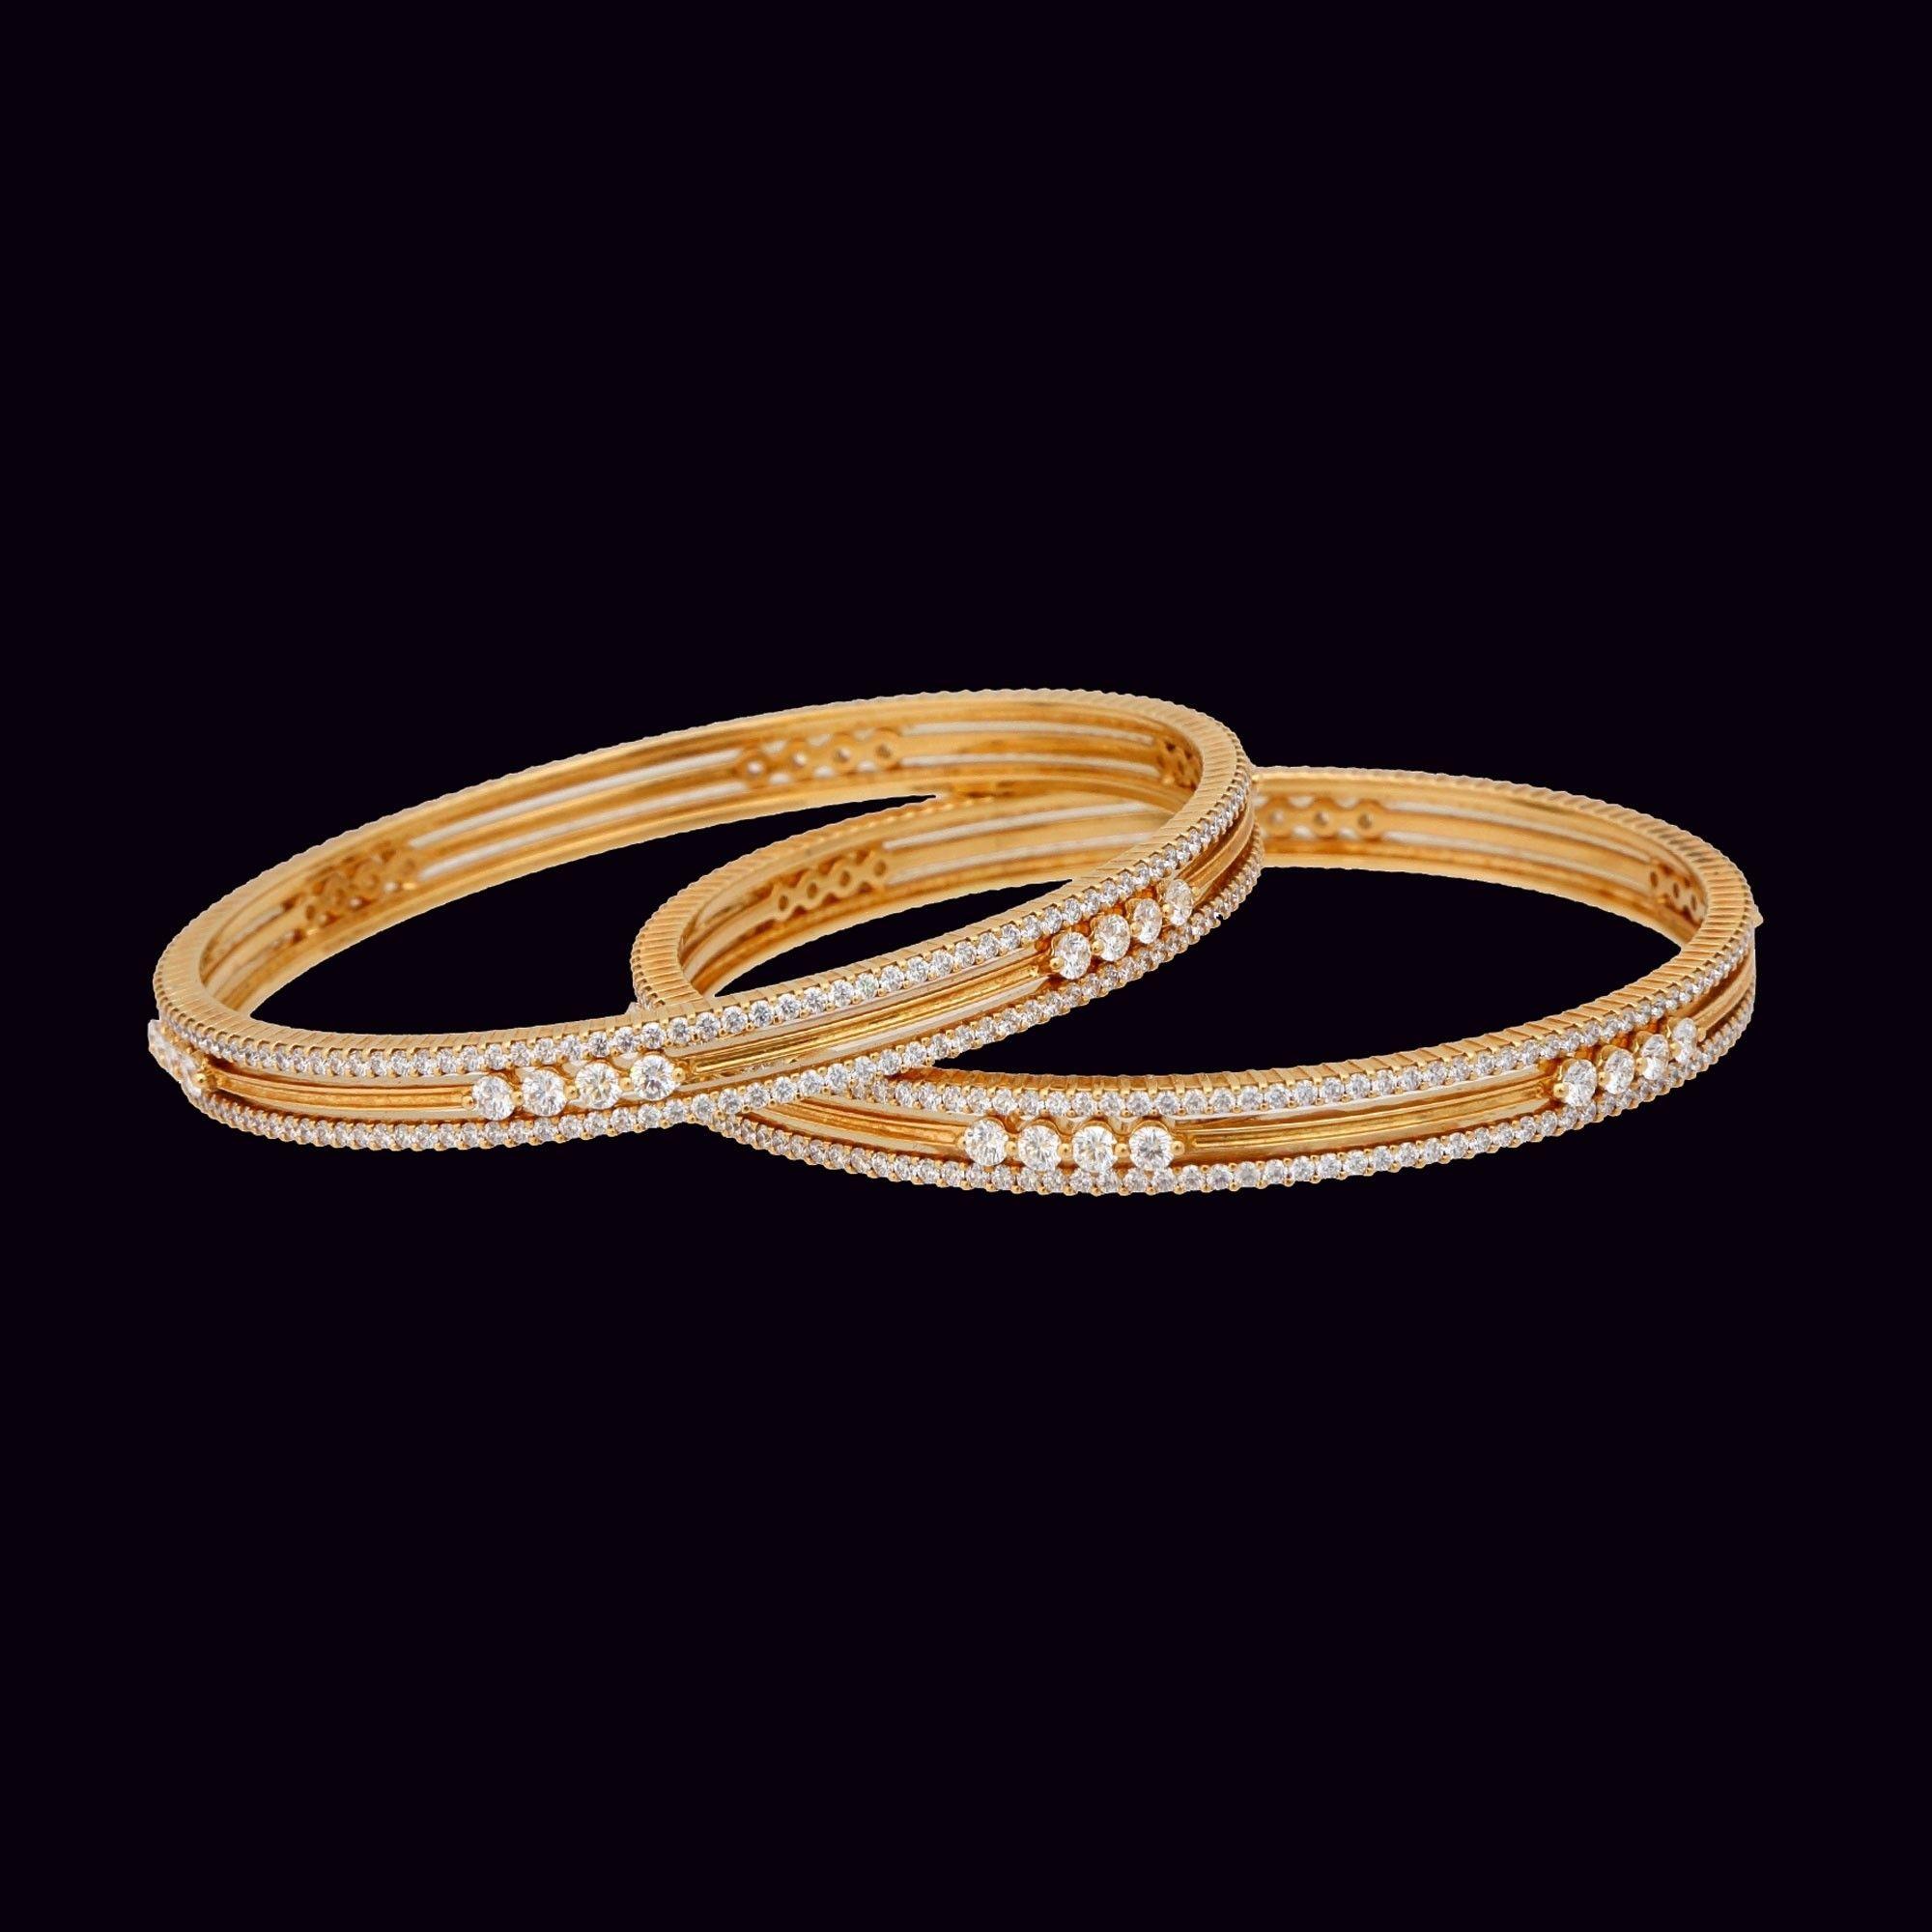 Vummidi bangaru jewellers bangals pinterest bangle diamond